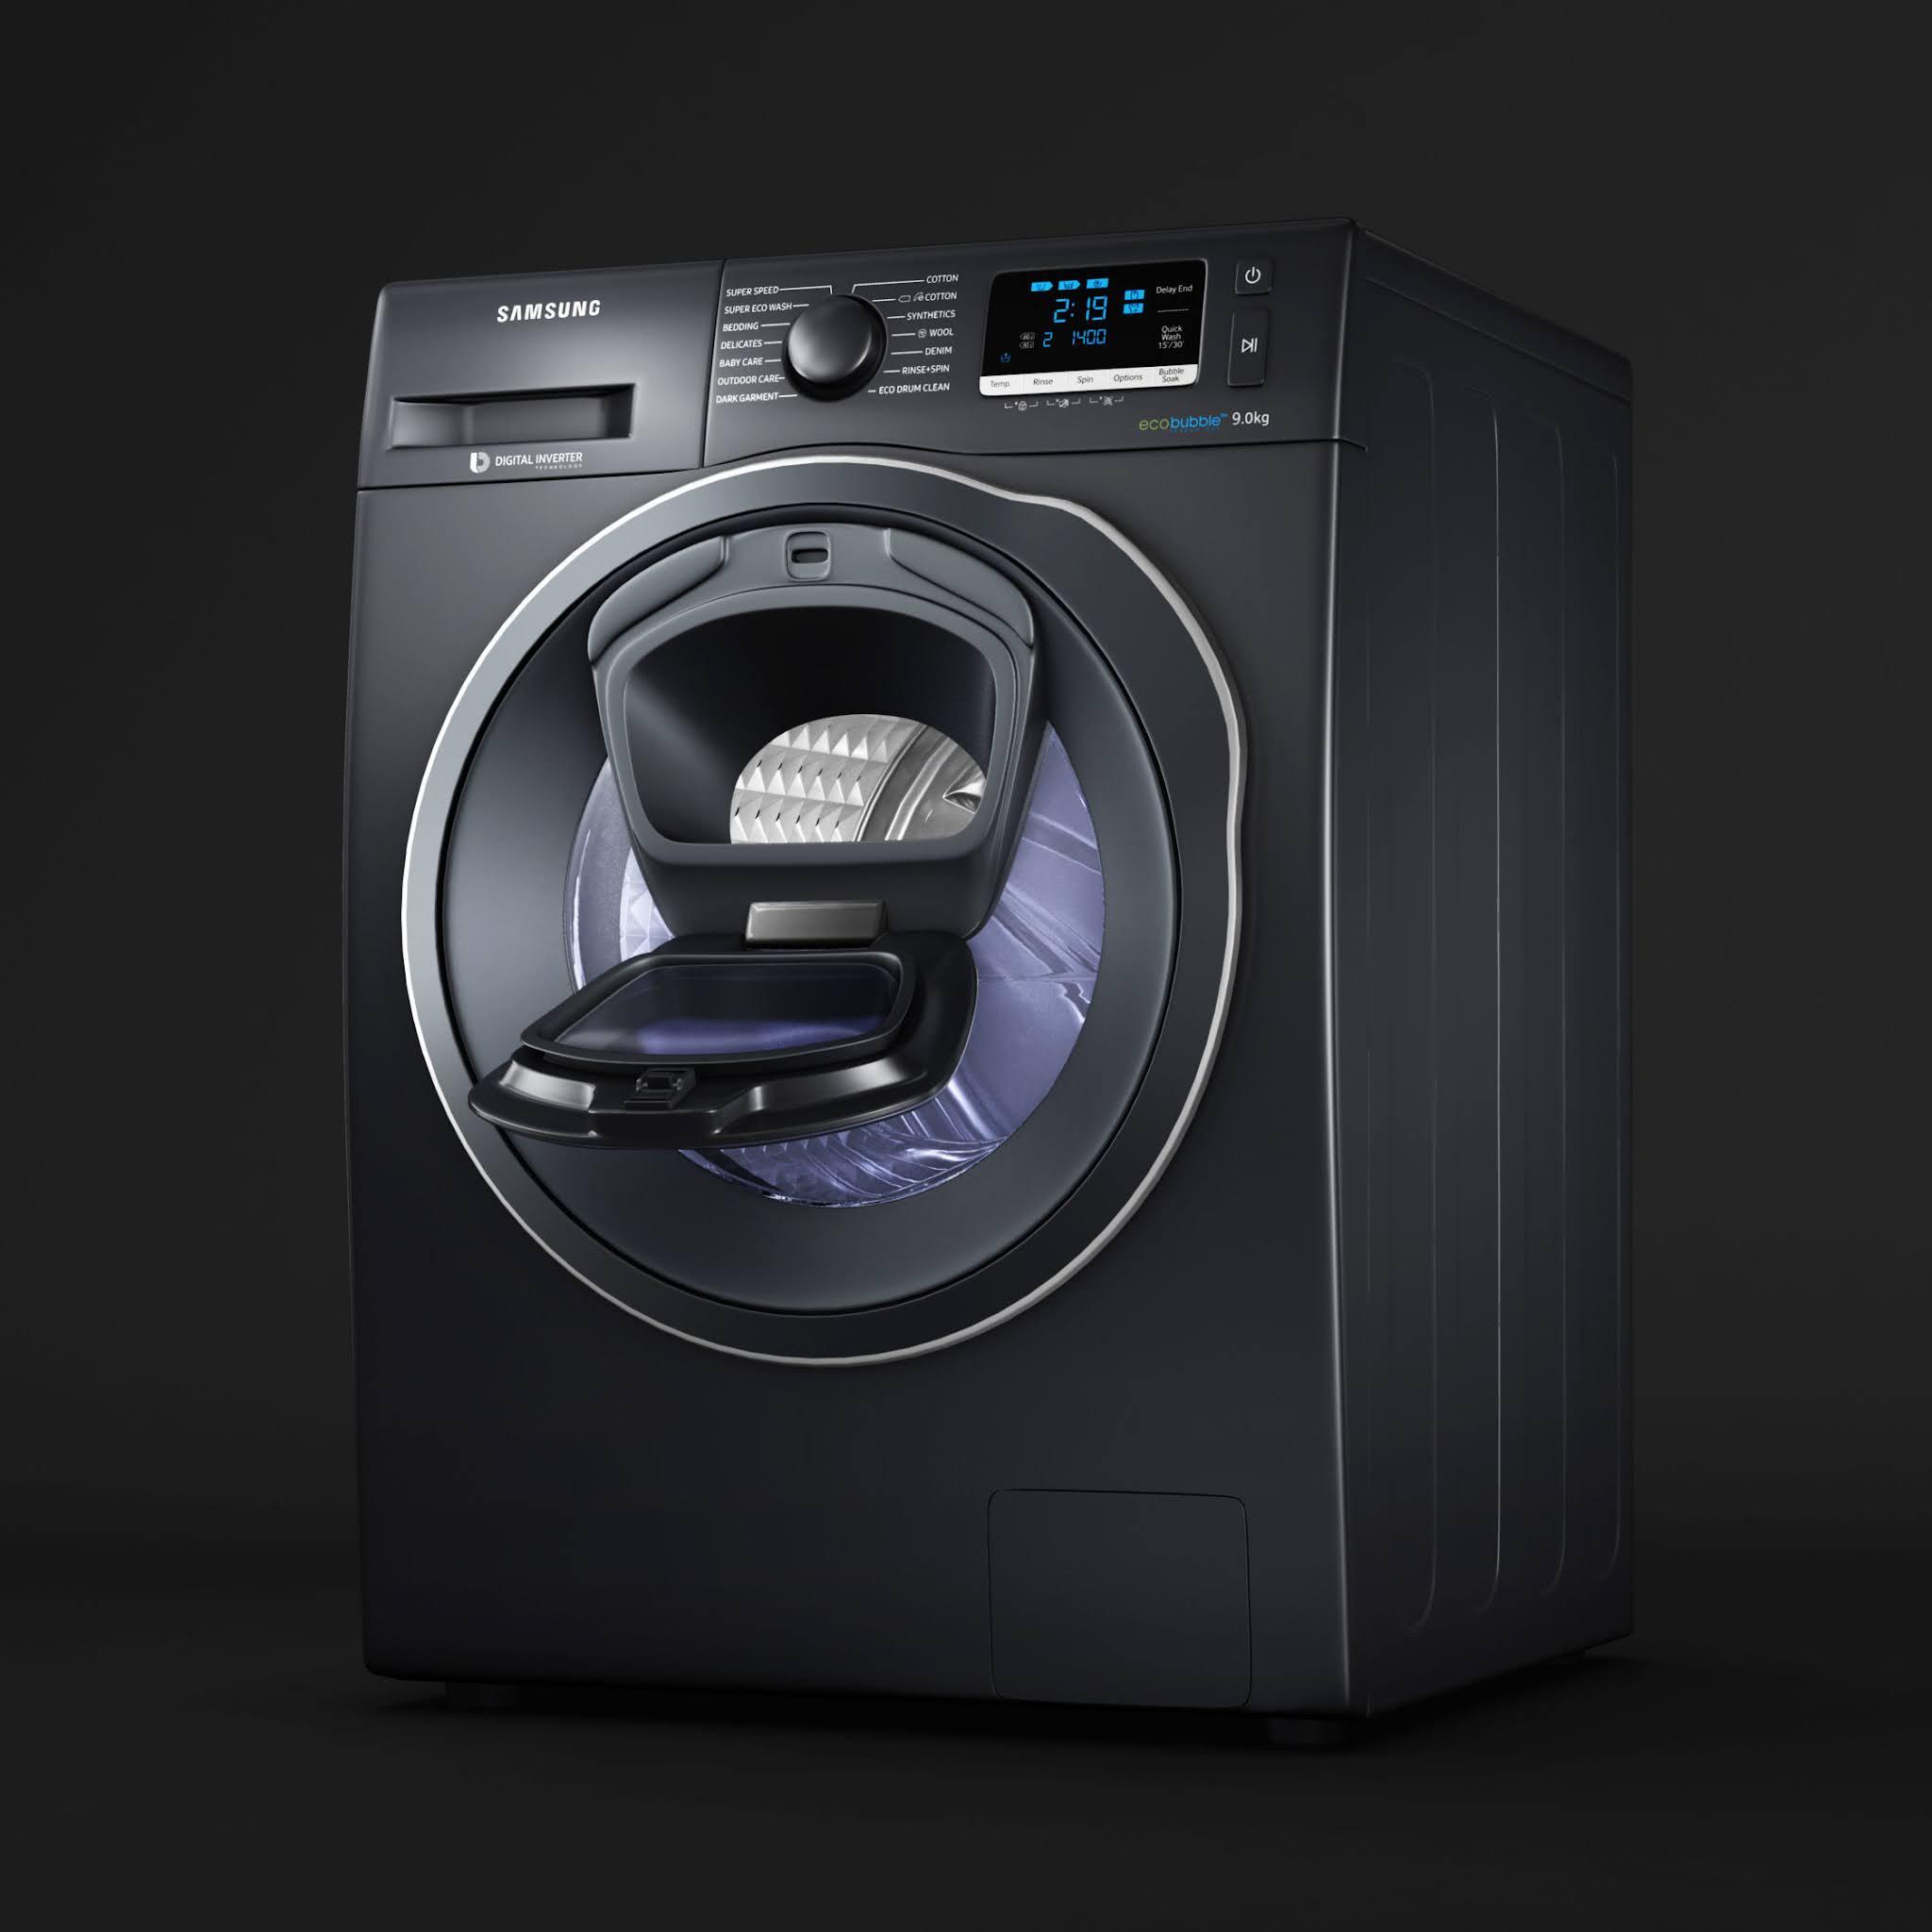 Samsung Washing Machine 4E, E1, 4C, CHE Error Code - How to fix